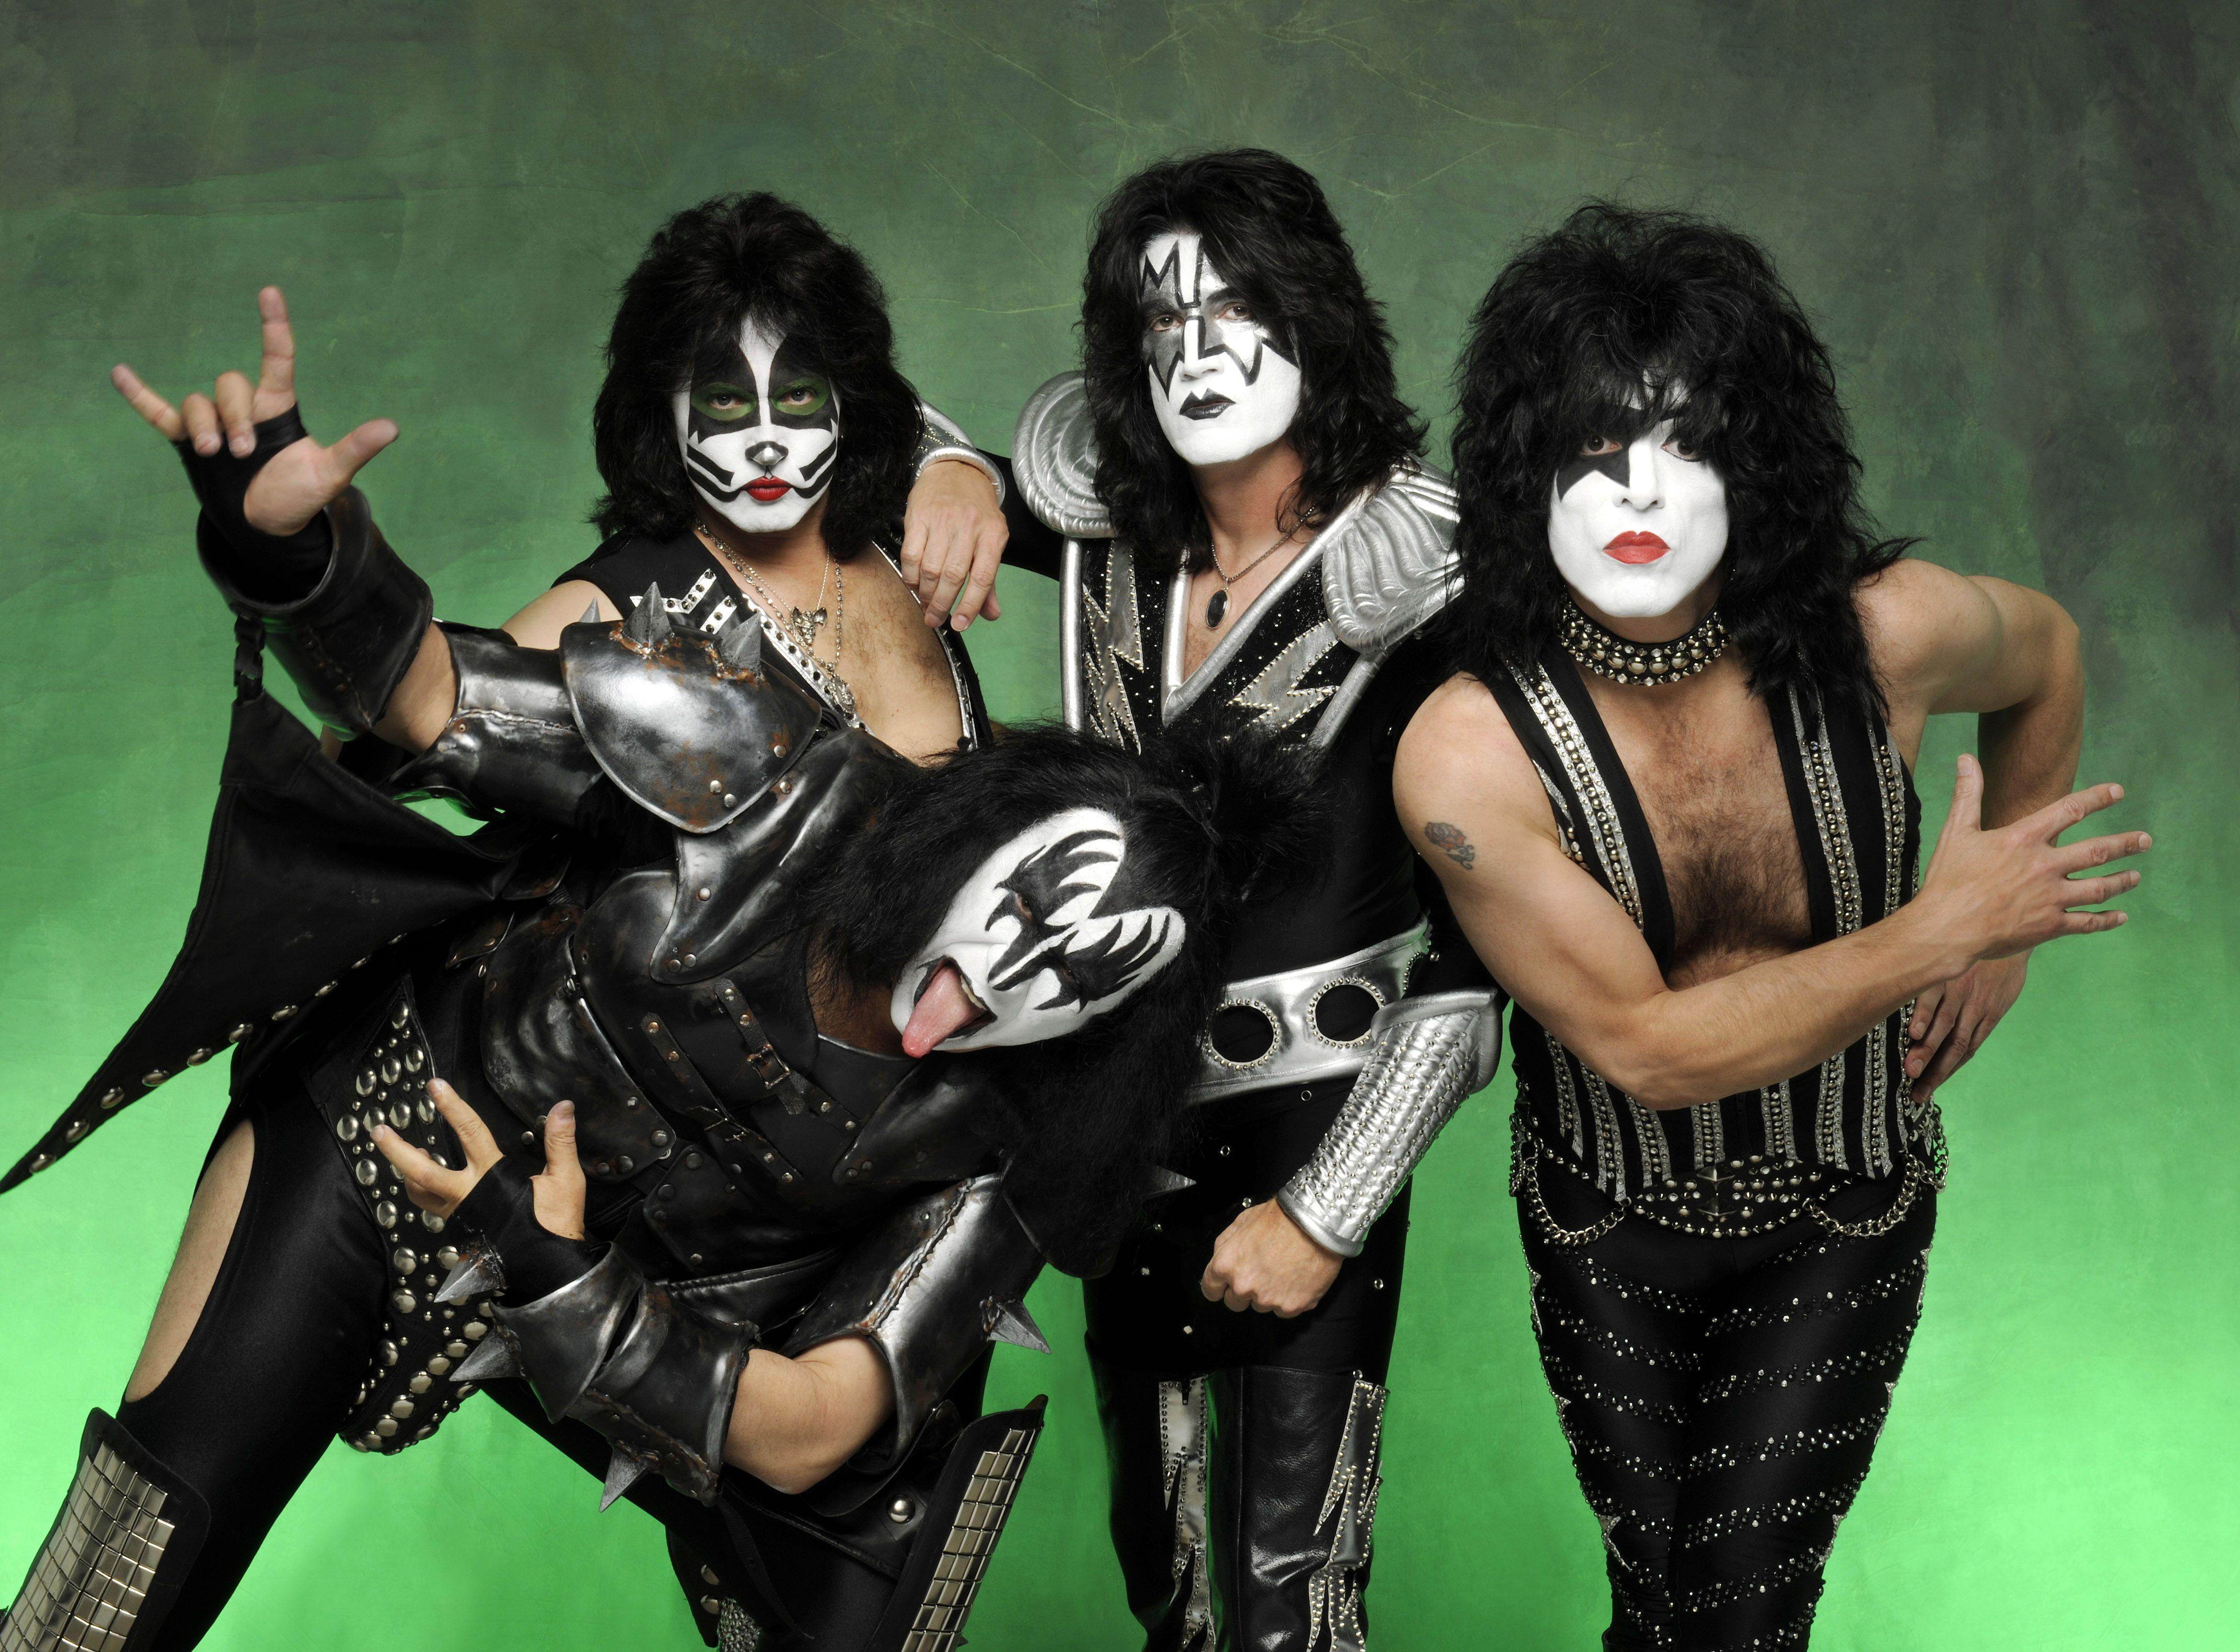 Band Kiss